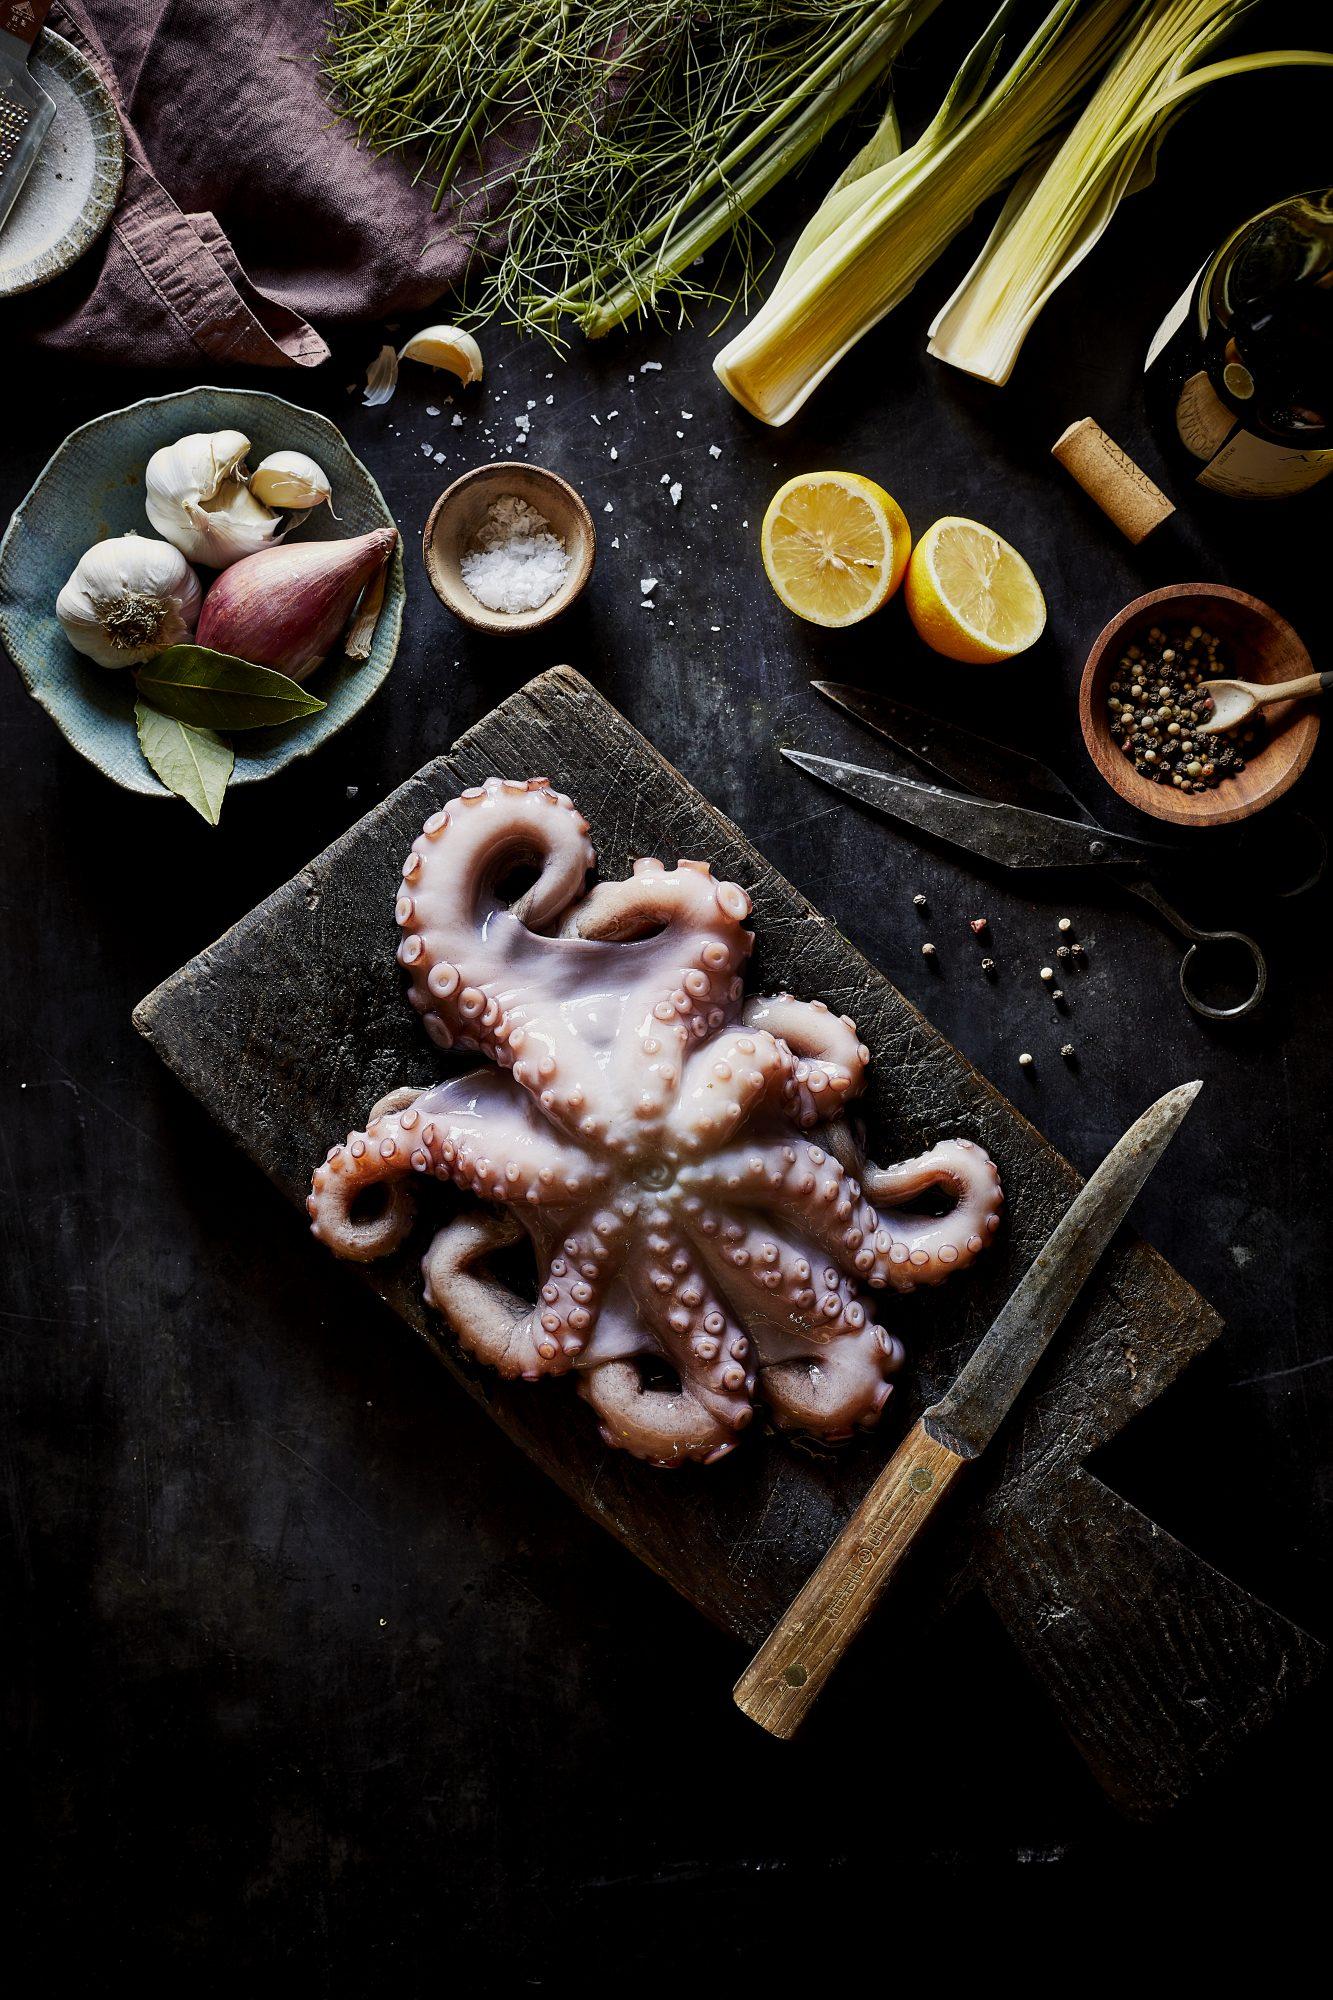 octopus prep image